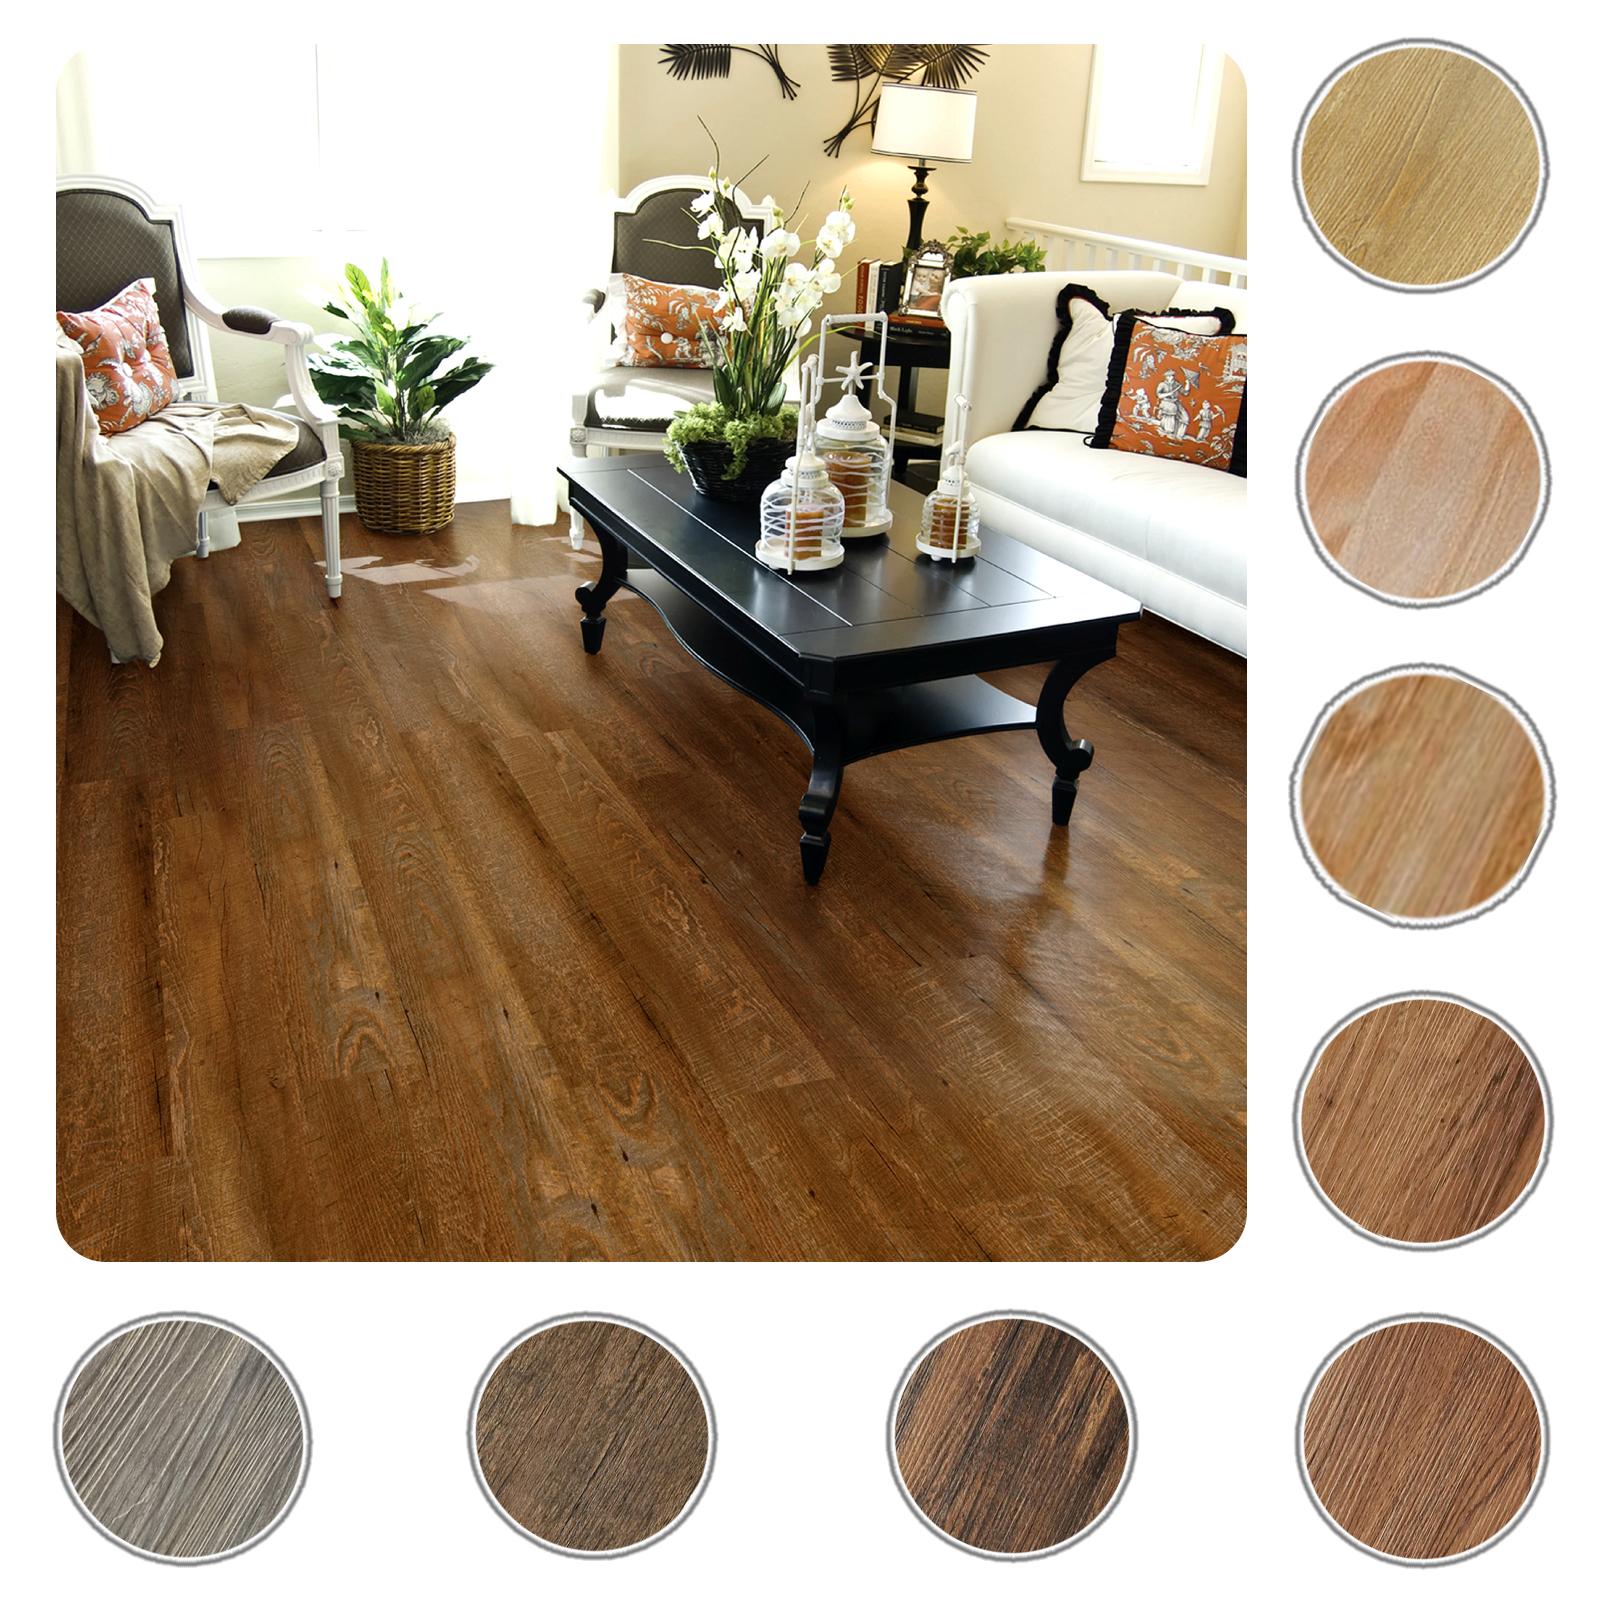 Self Adhesive Vinyl Planks Hardwood Wood Peel N Stick Floor Tiles